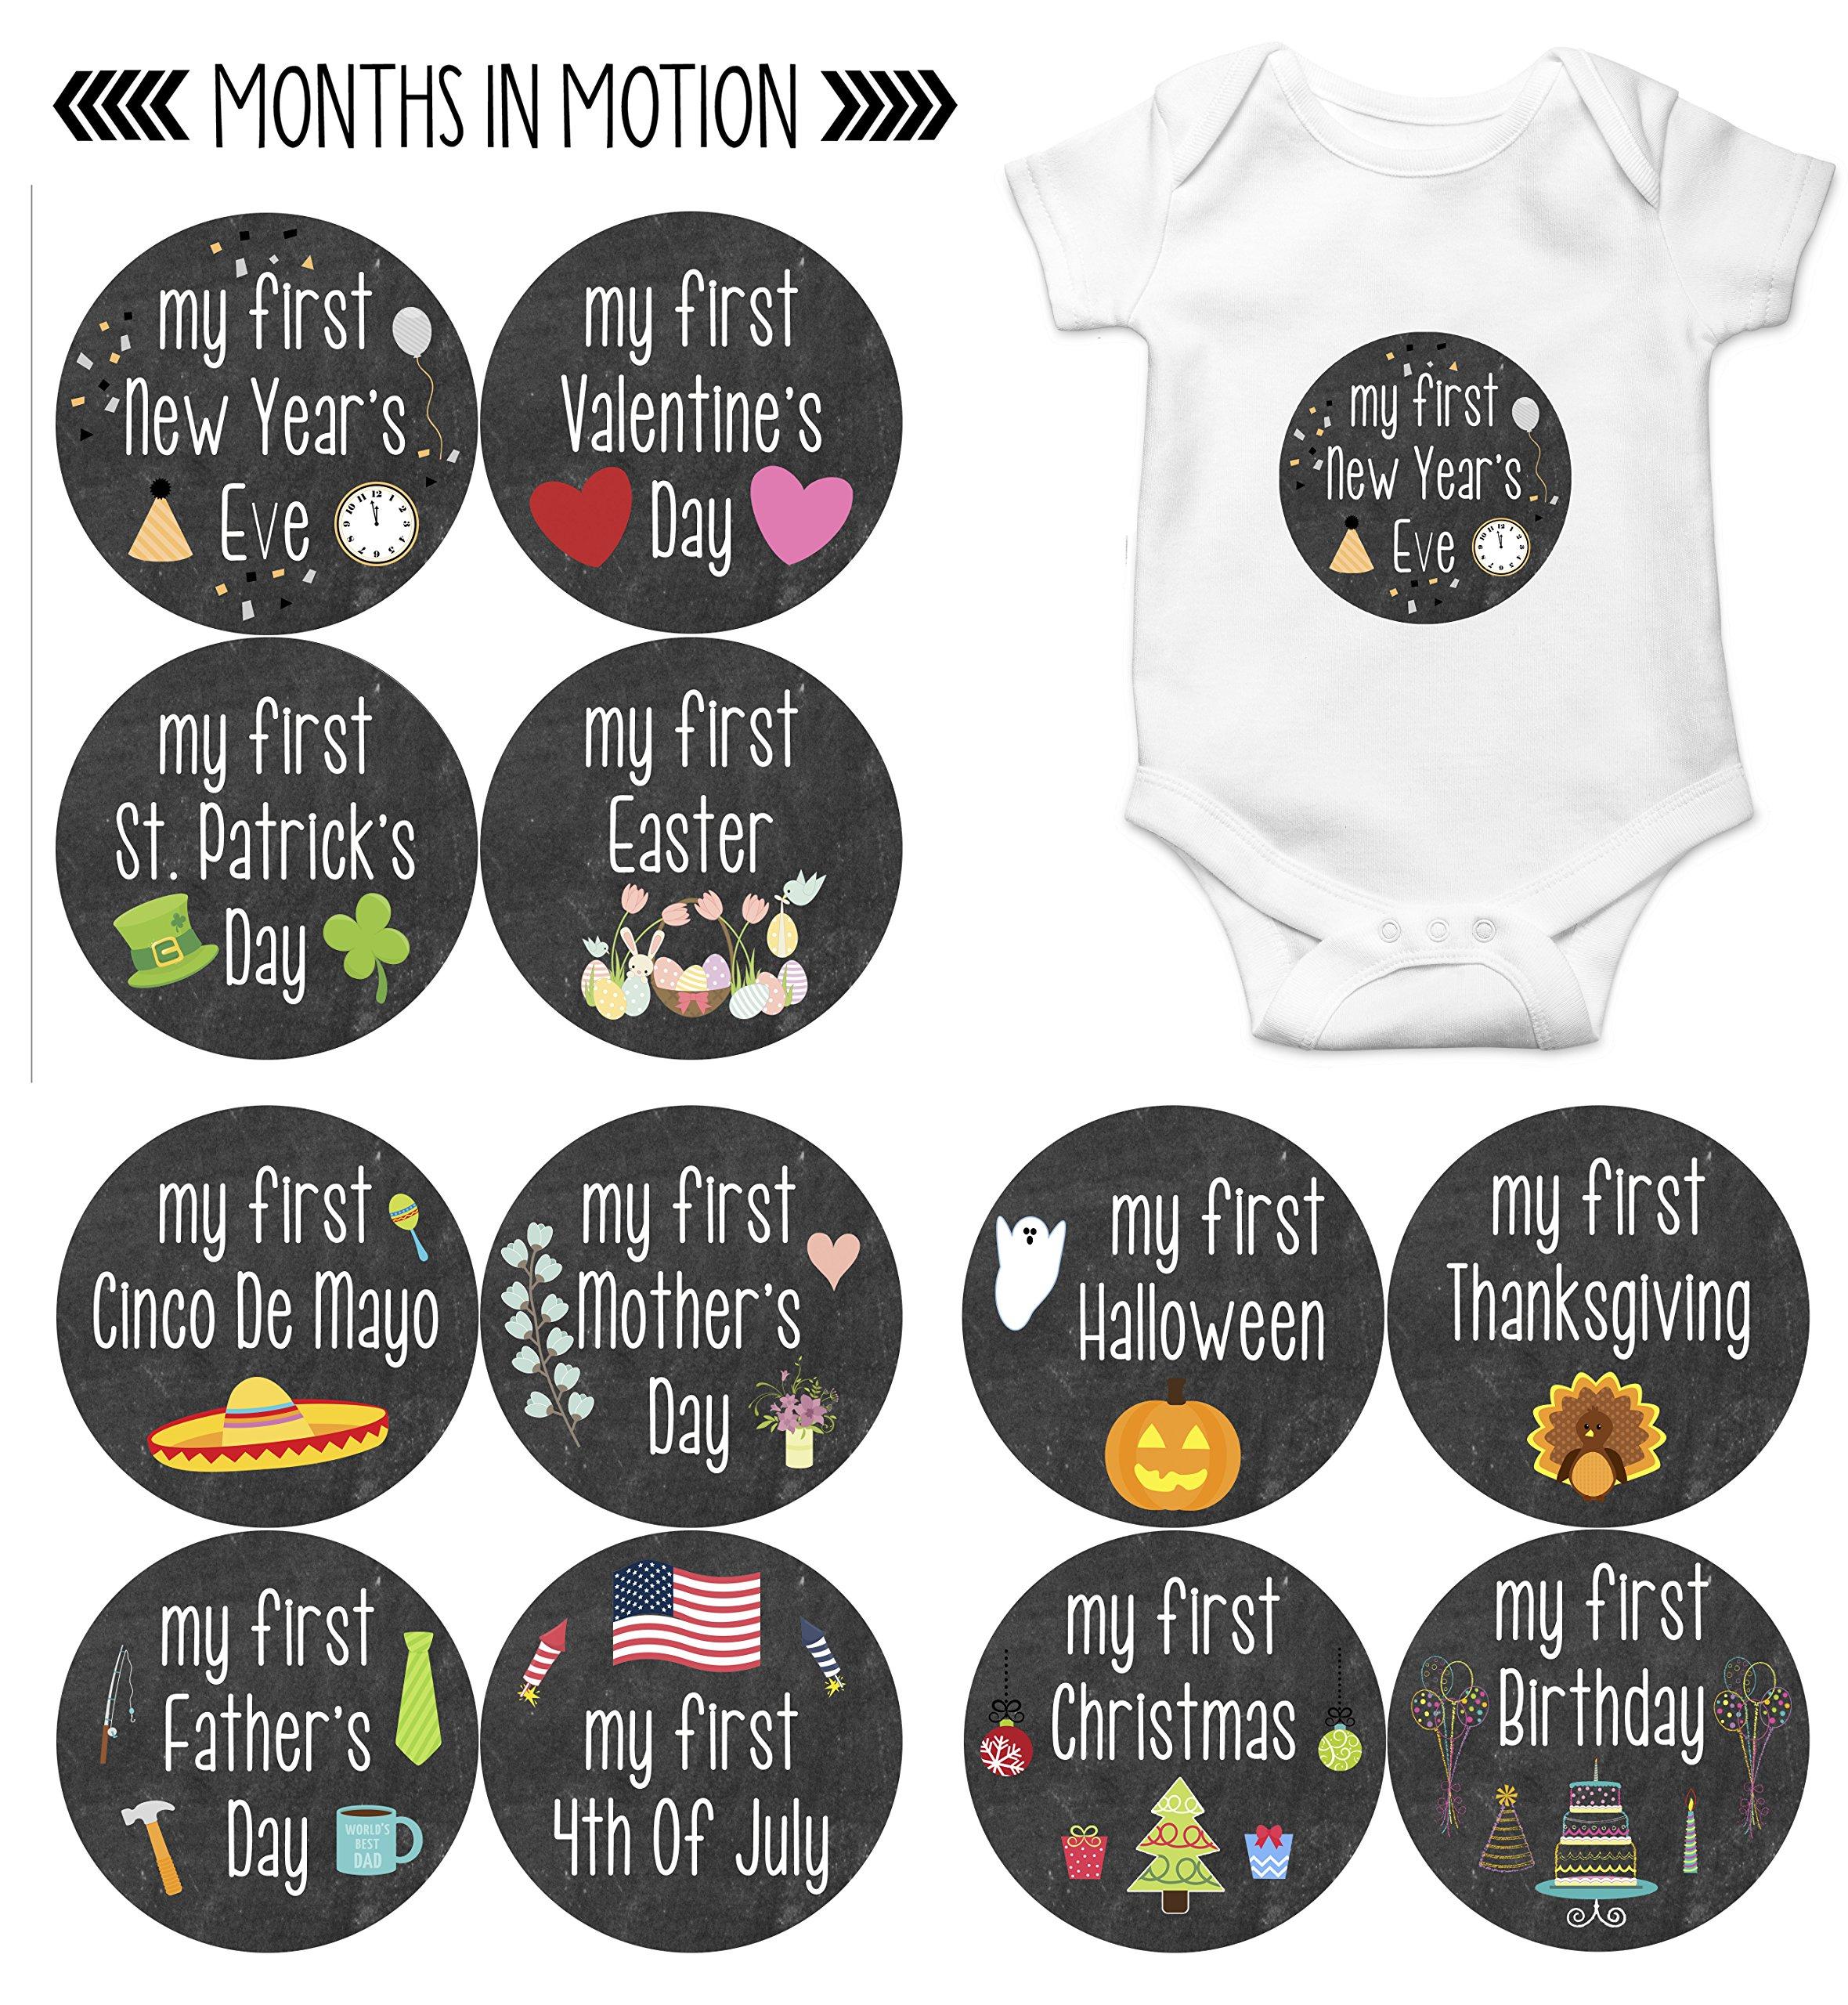 Amazon.com : My First Holiday Baby Stickers Milestone Christmas ...